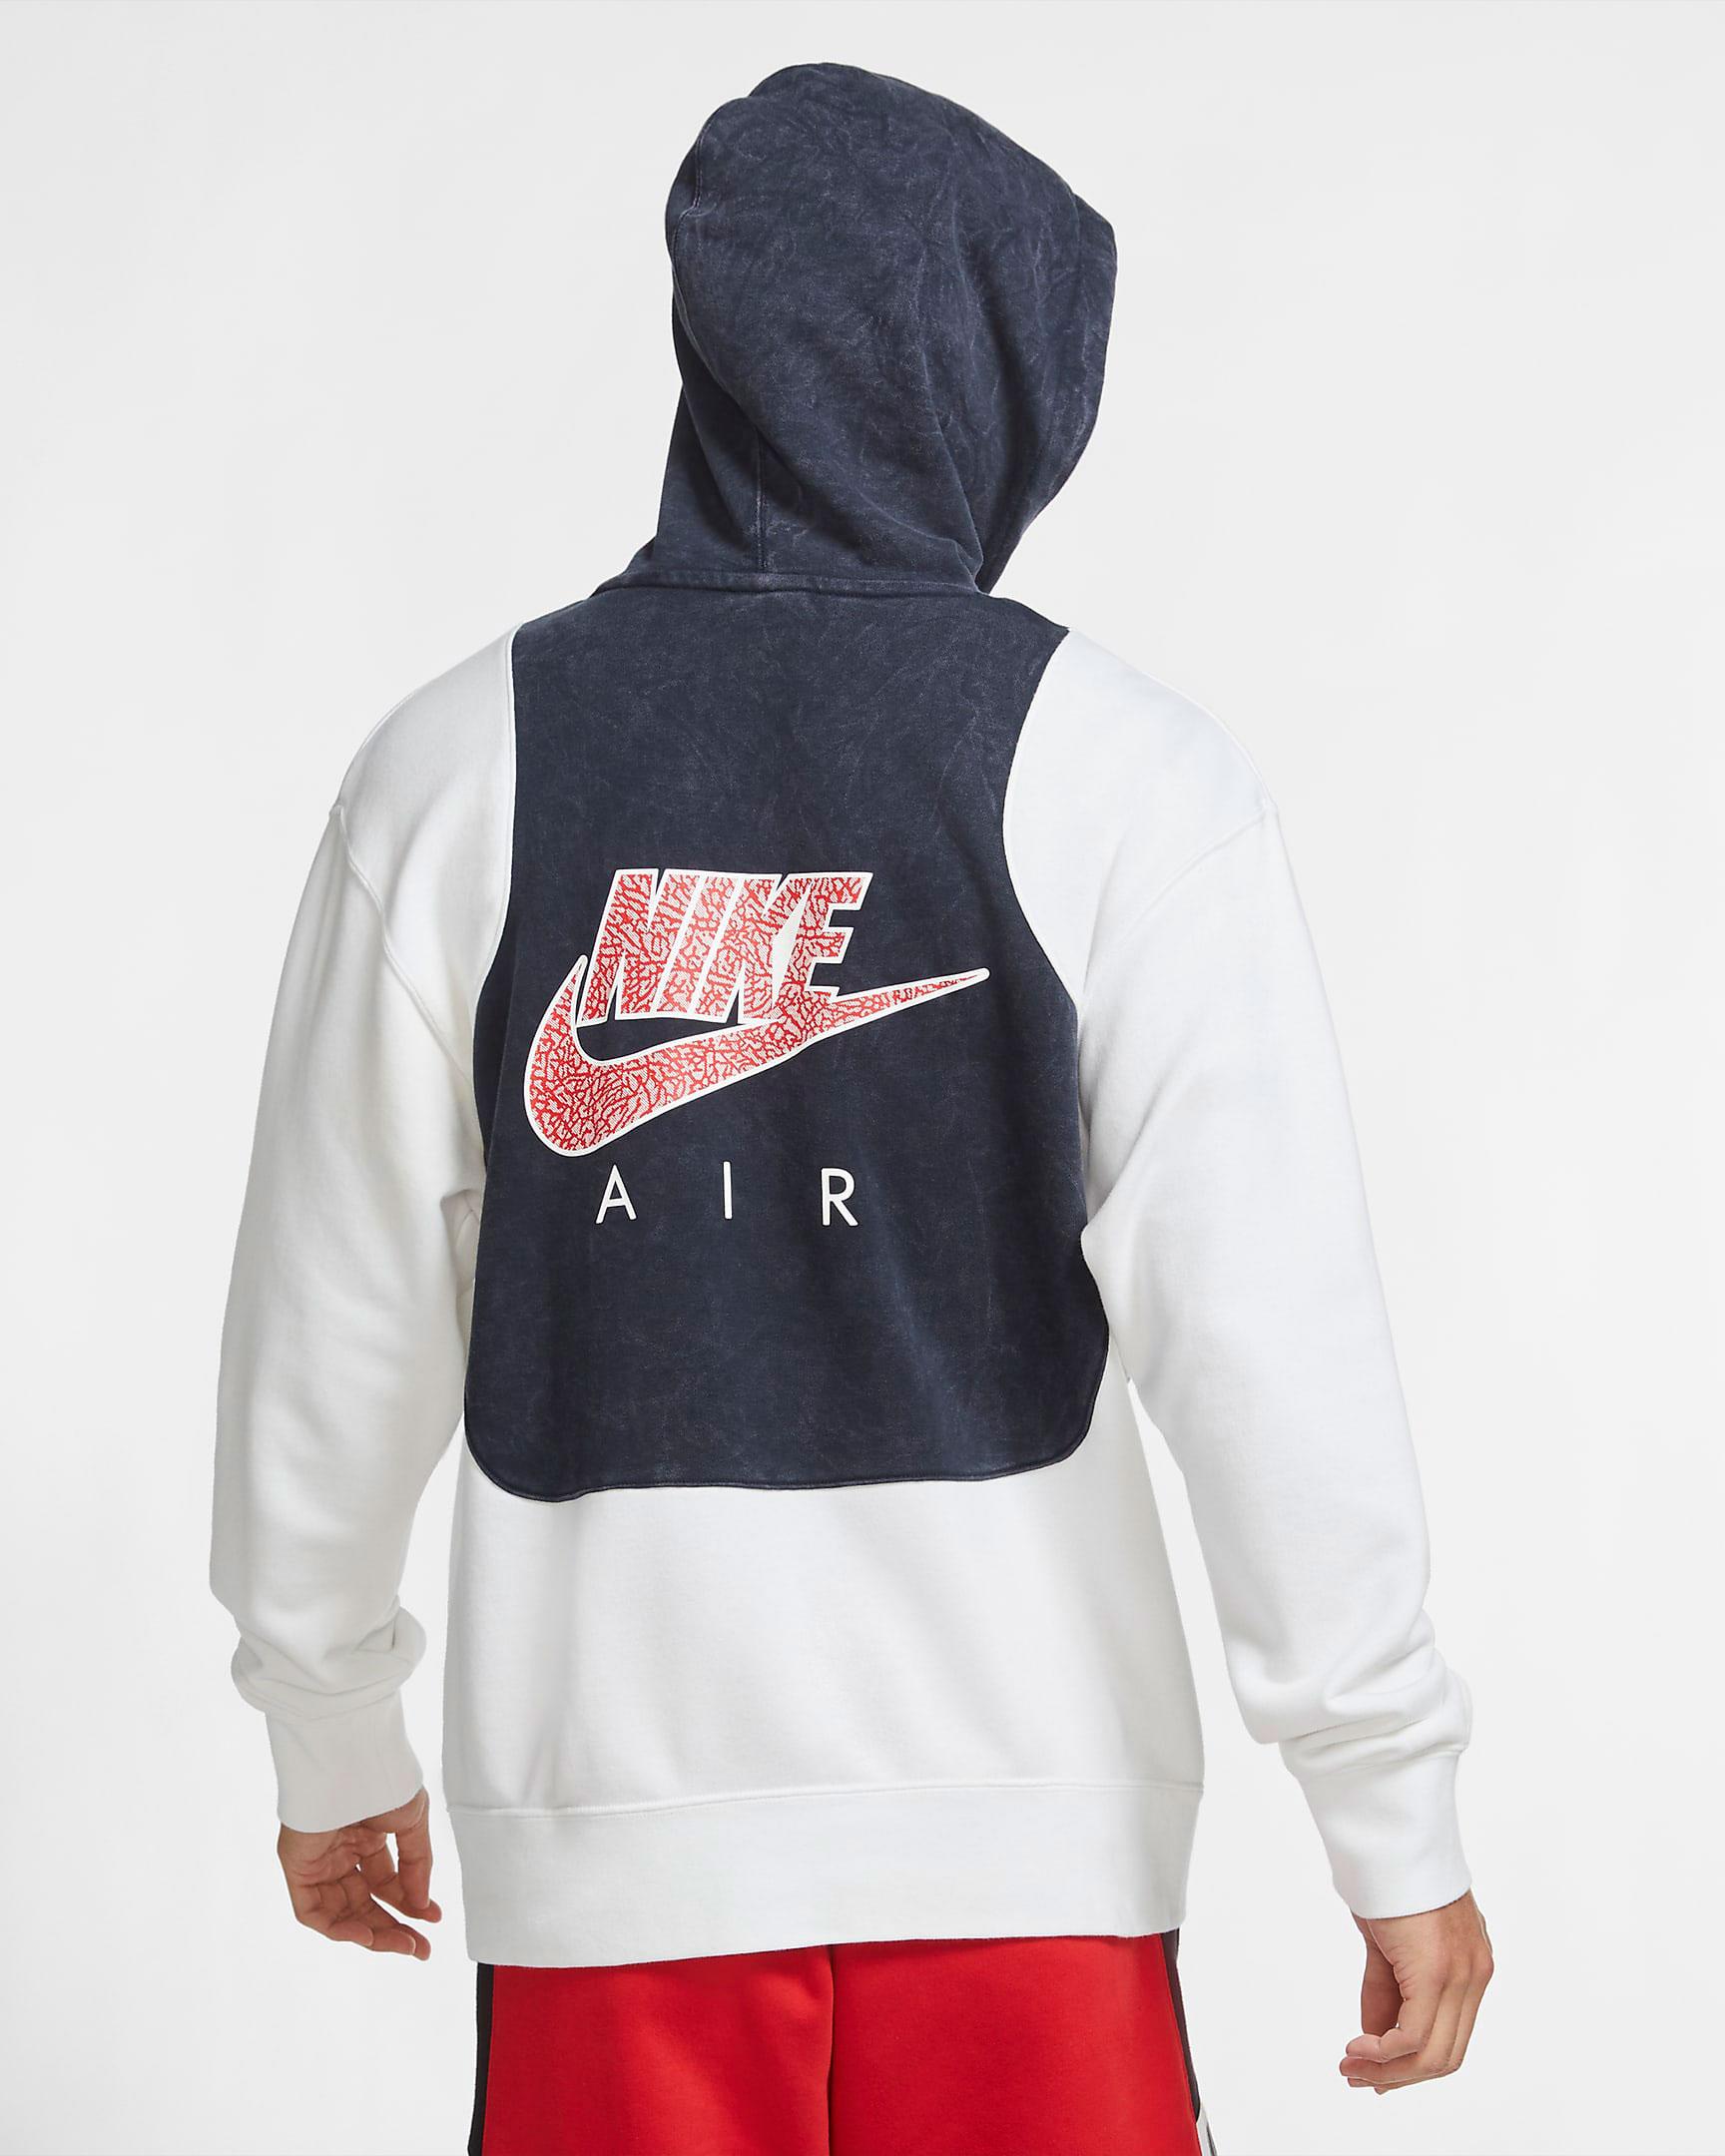 air-jordan-3-denim-fire-red-japan-hoodie-2